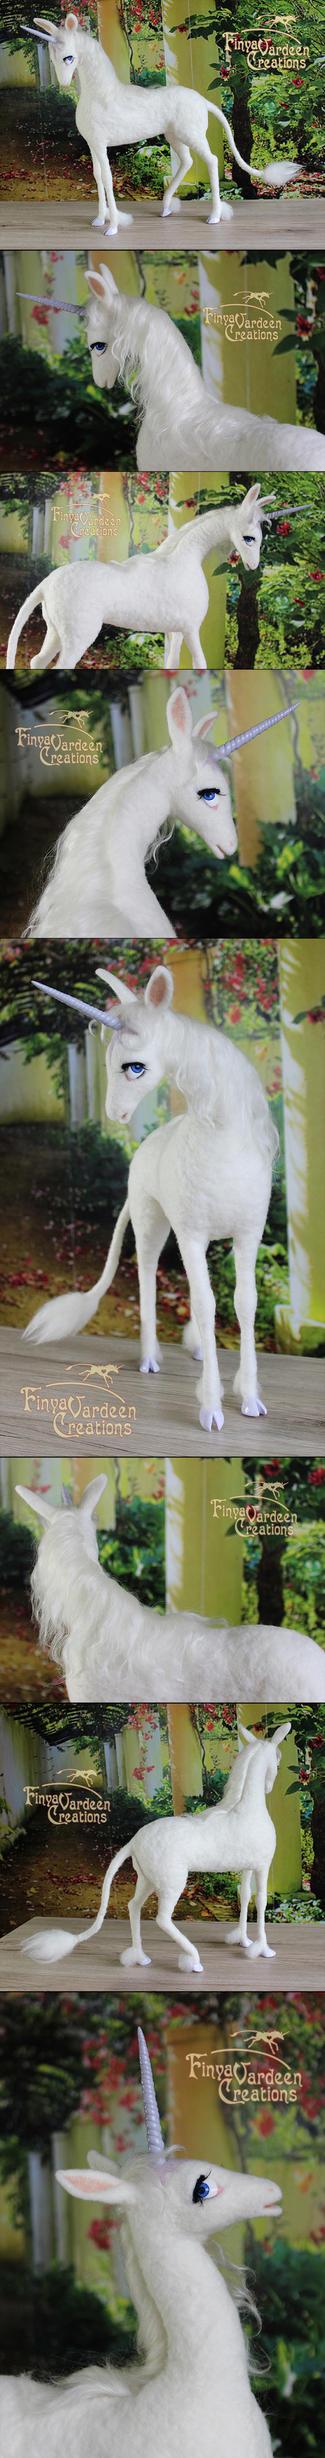 The Last Unicorn - needle felted by Finya-Vardeen